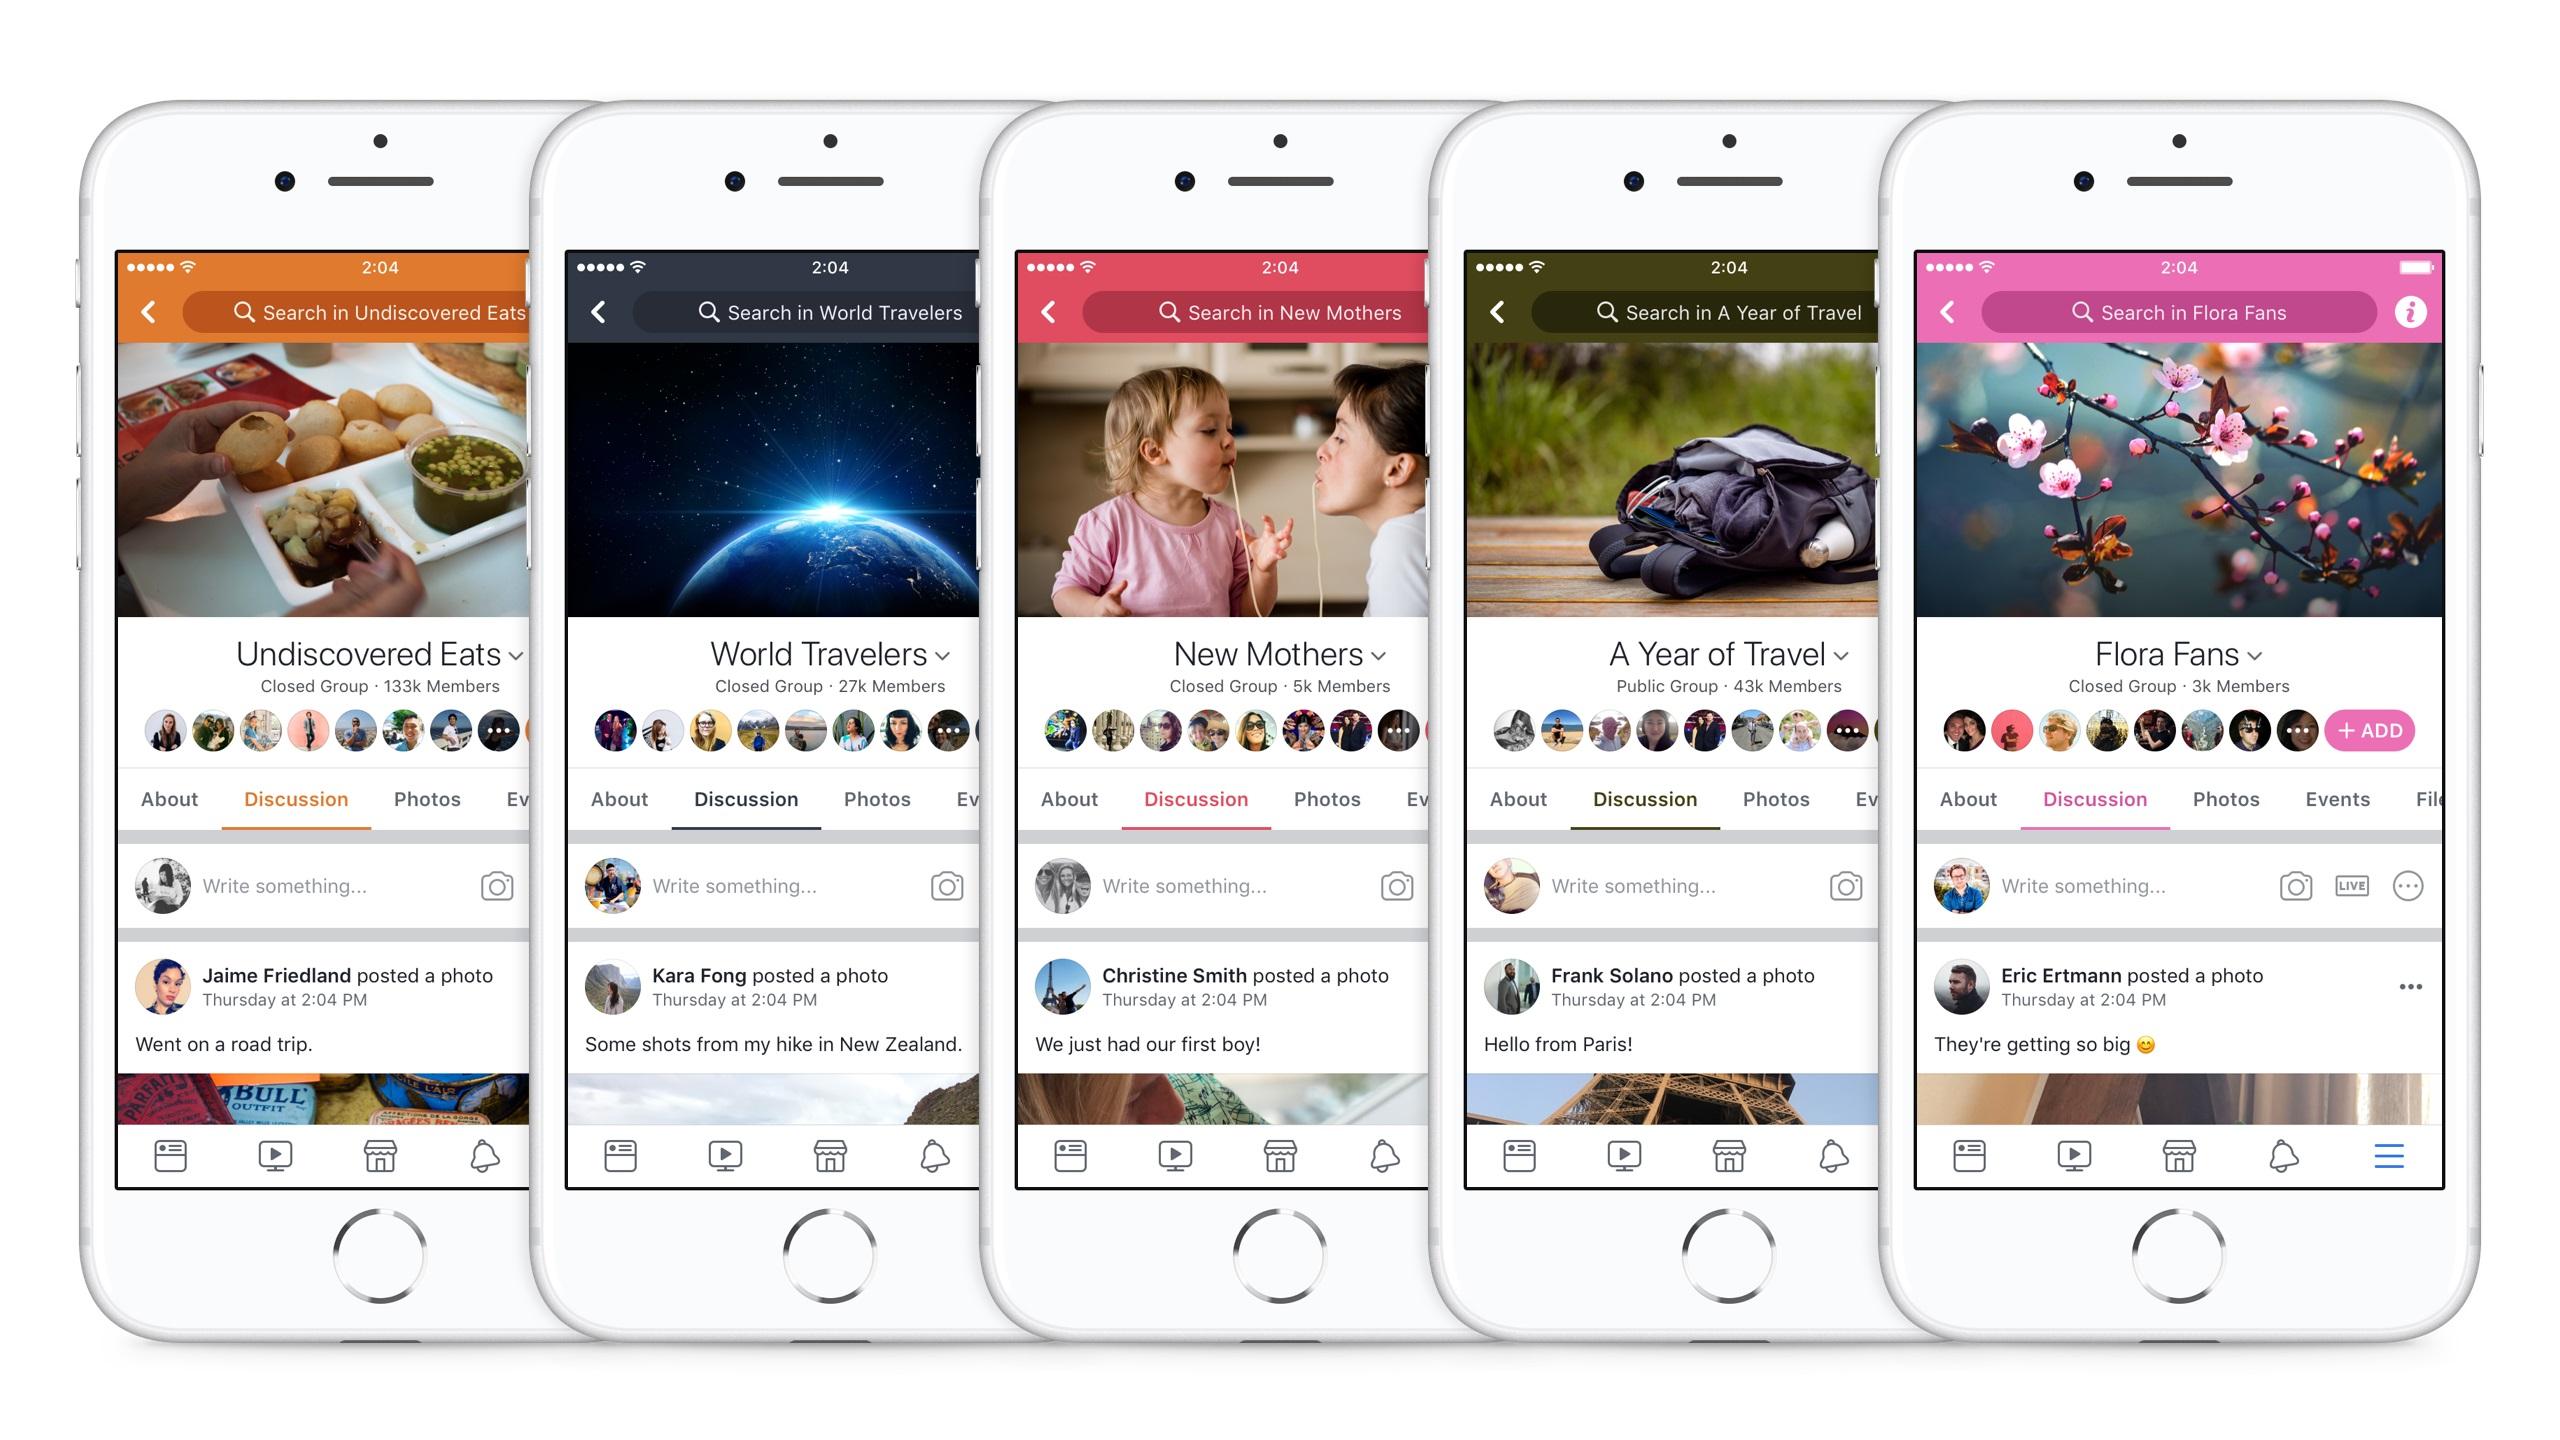 Facebook intensifie son support pour les groupes